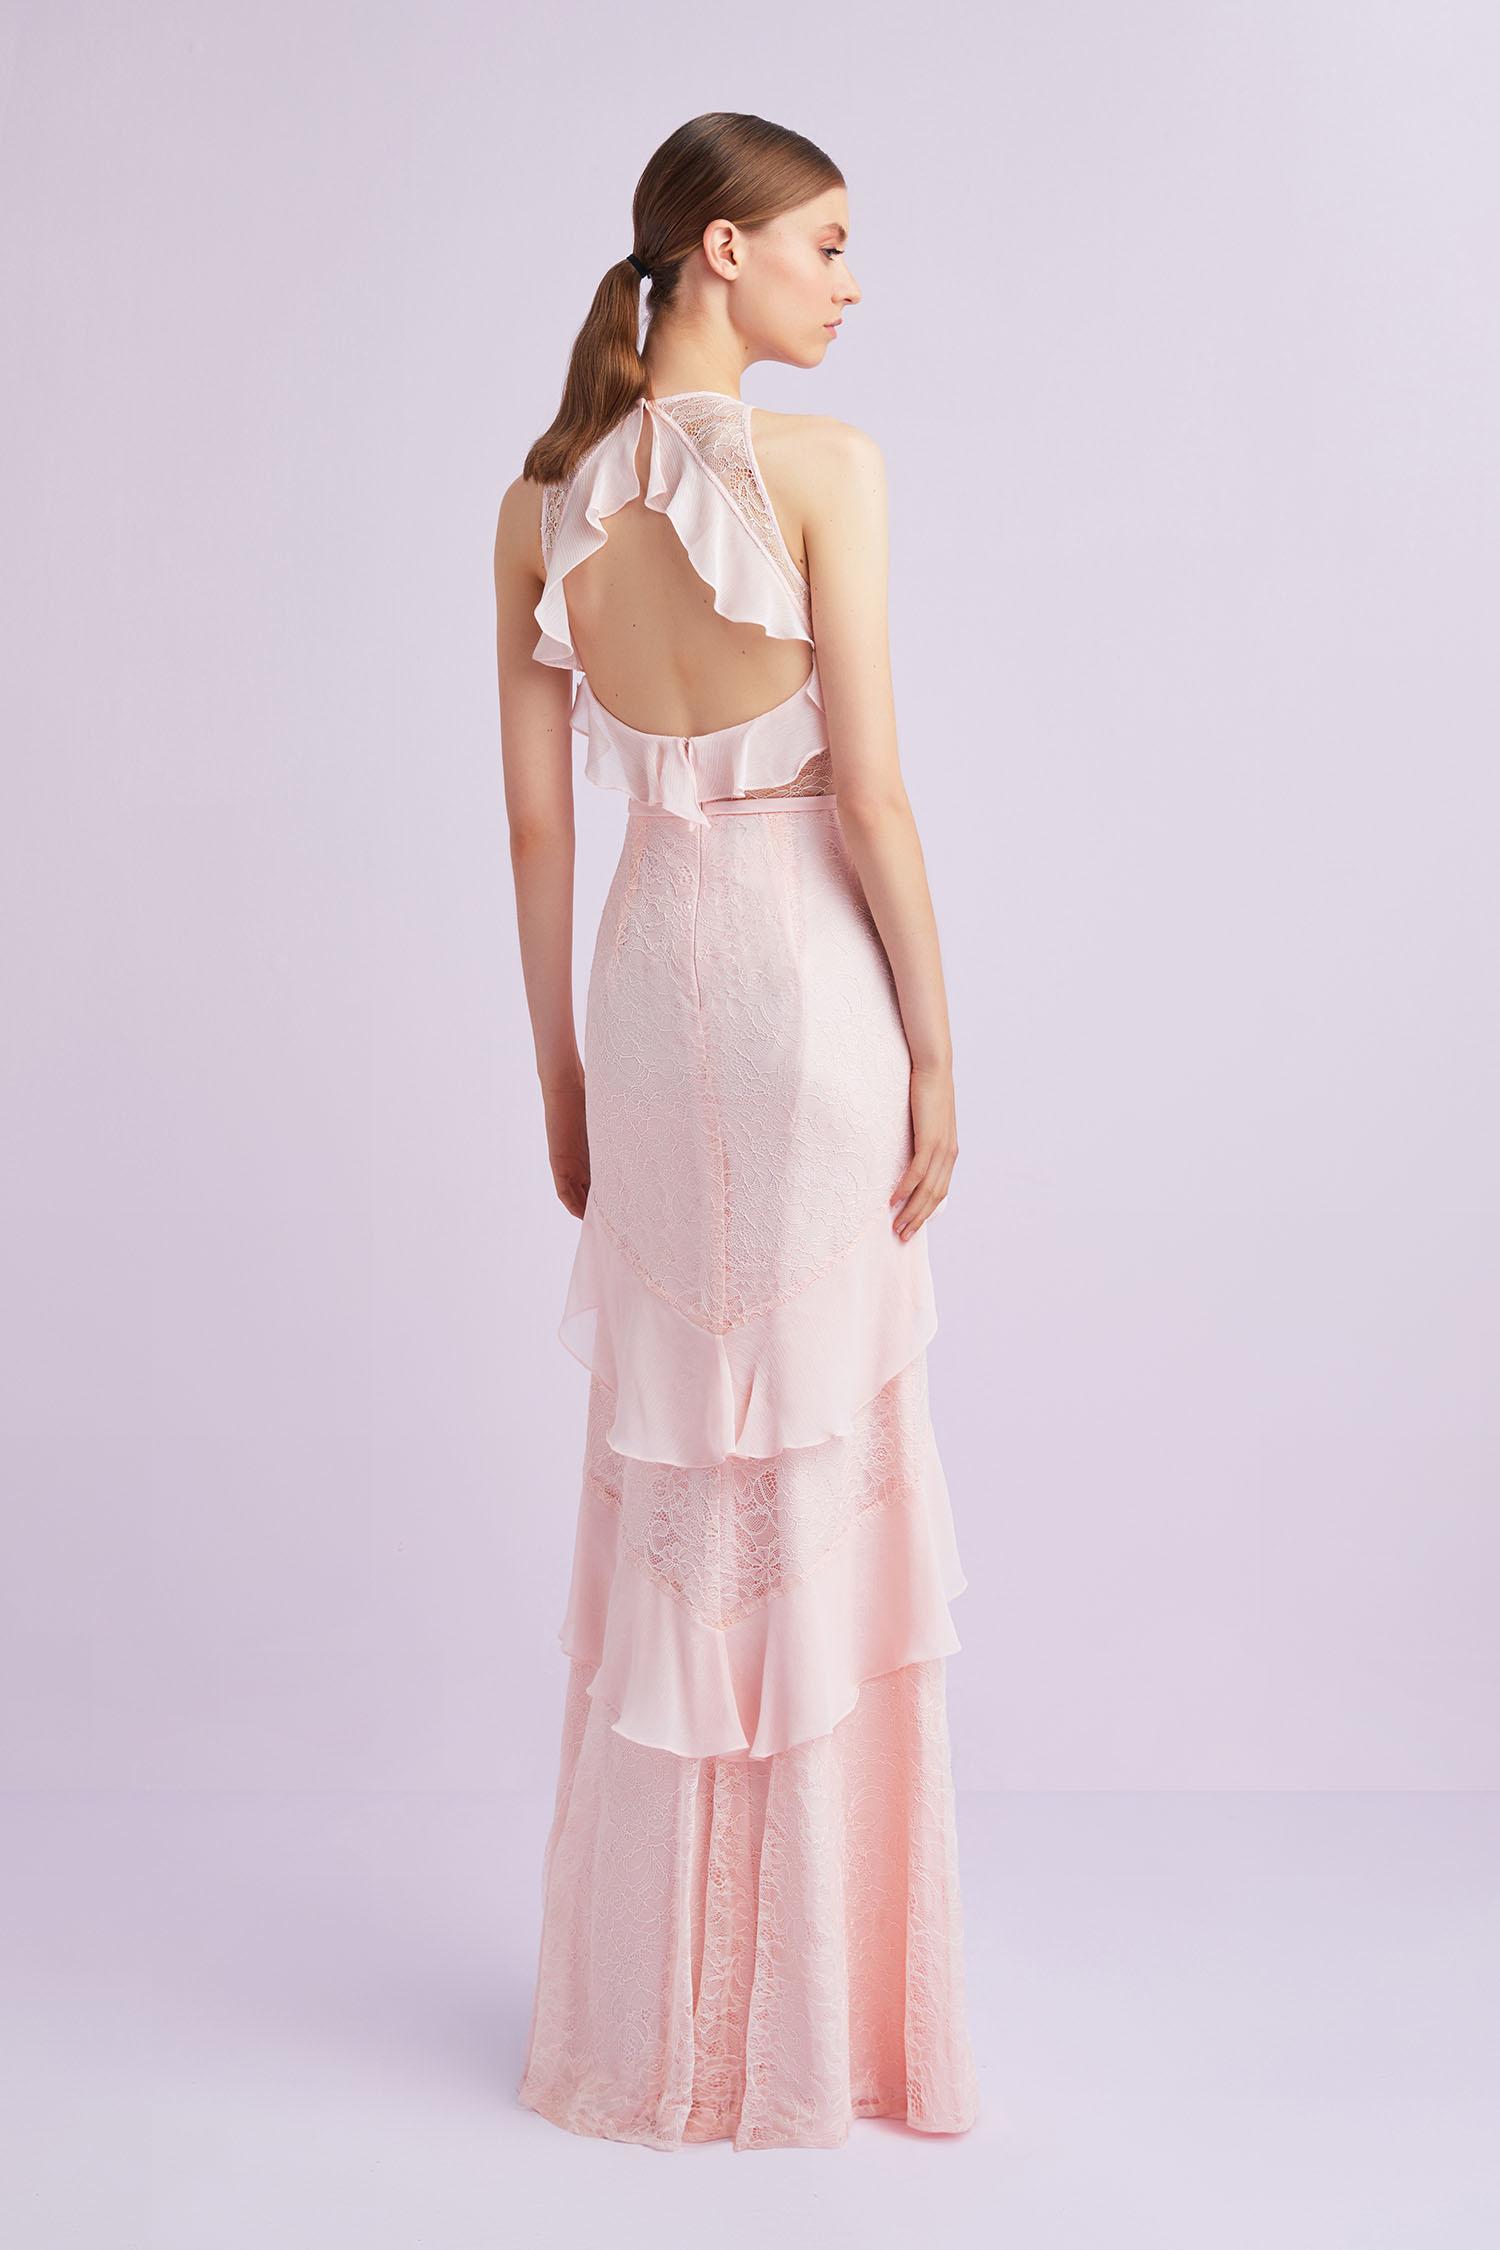 Toz Pembe Halter Yaka Uzun Abiye Elbise - Thumbnail